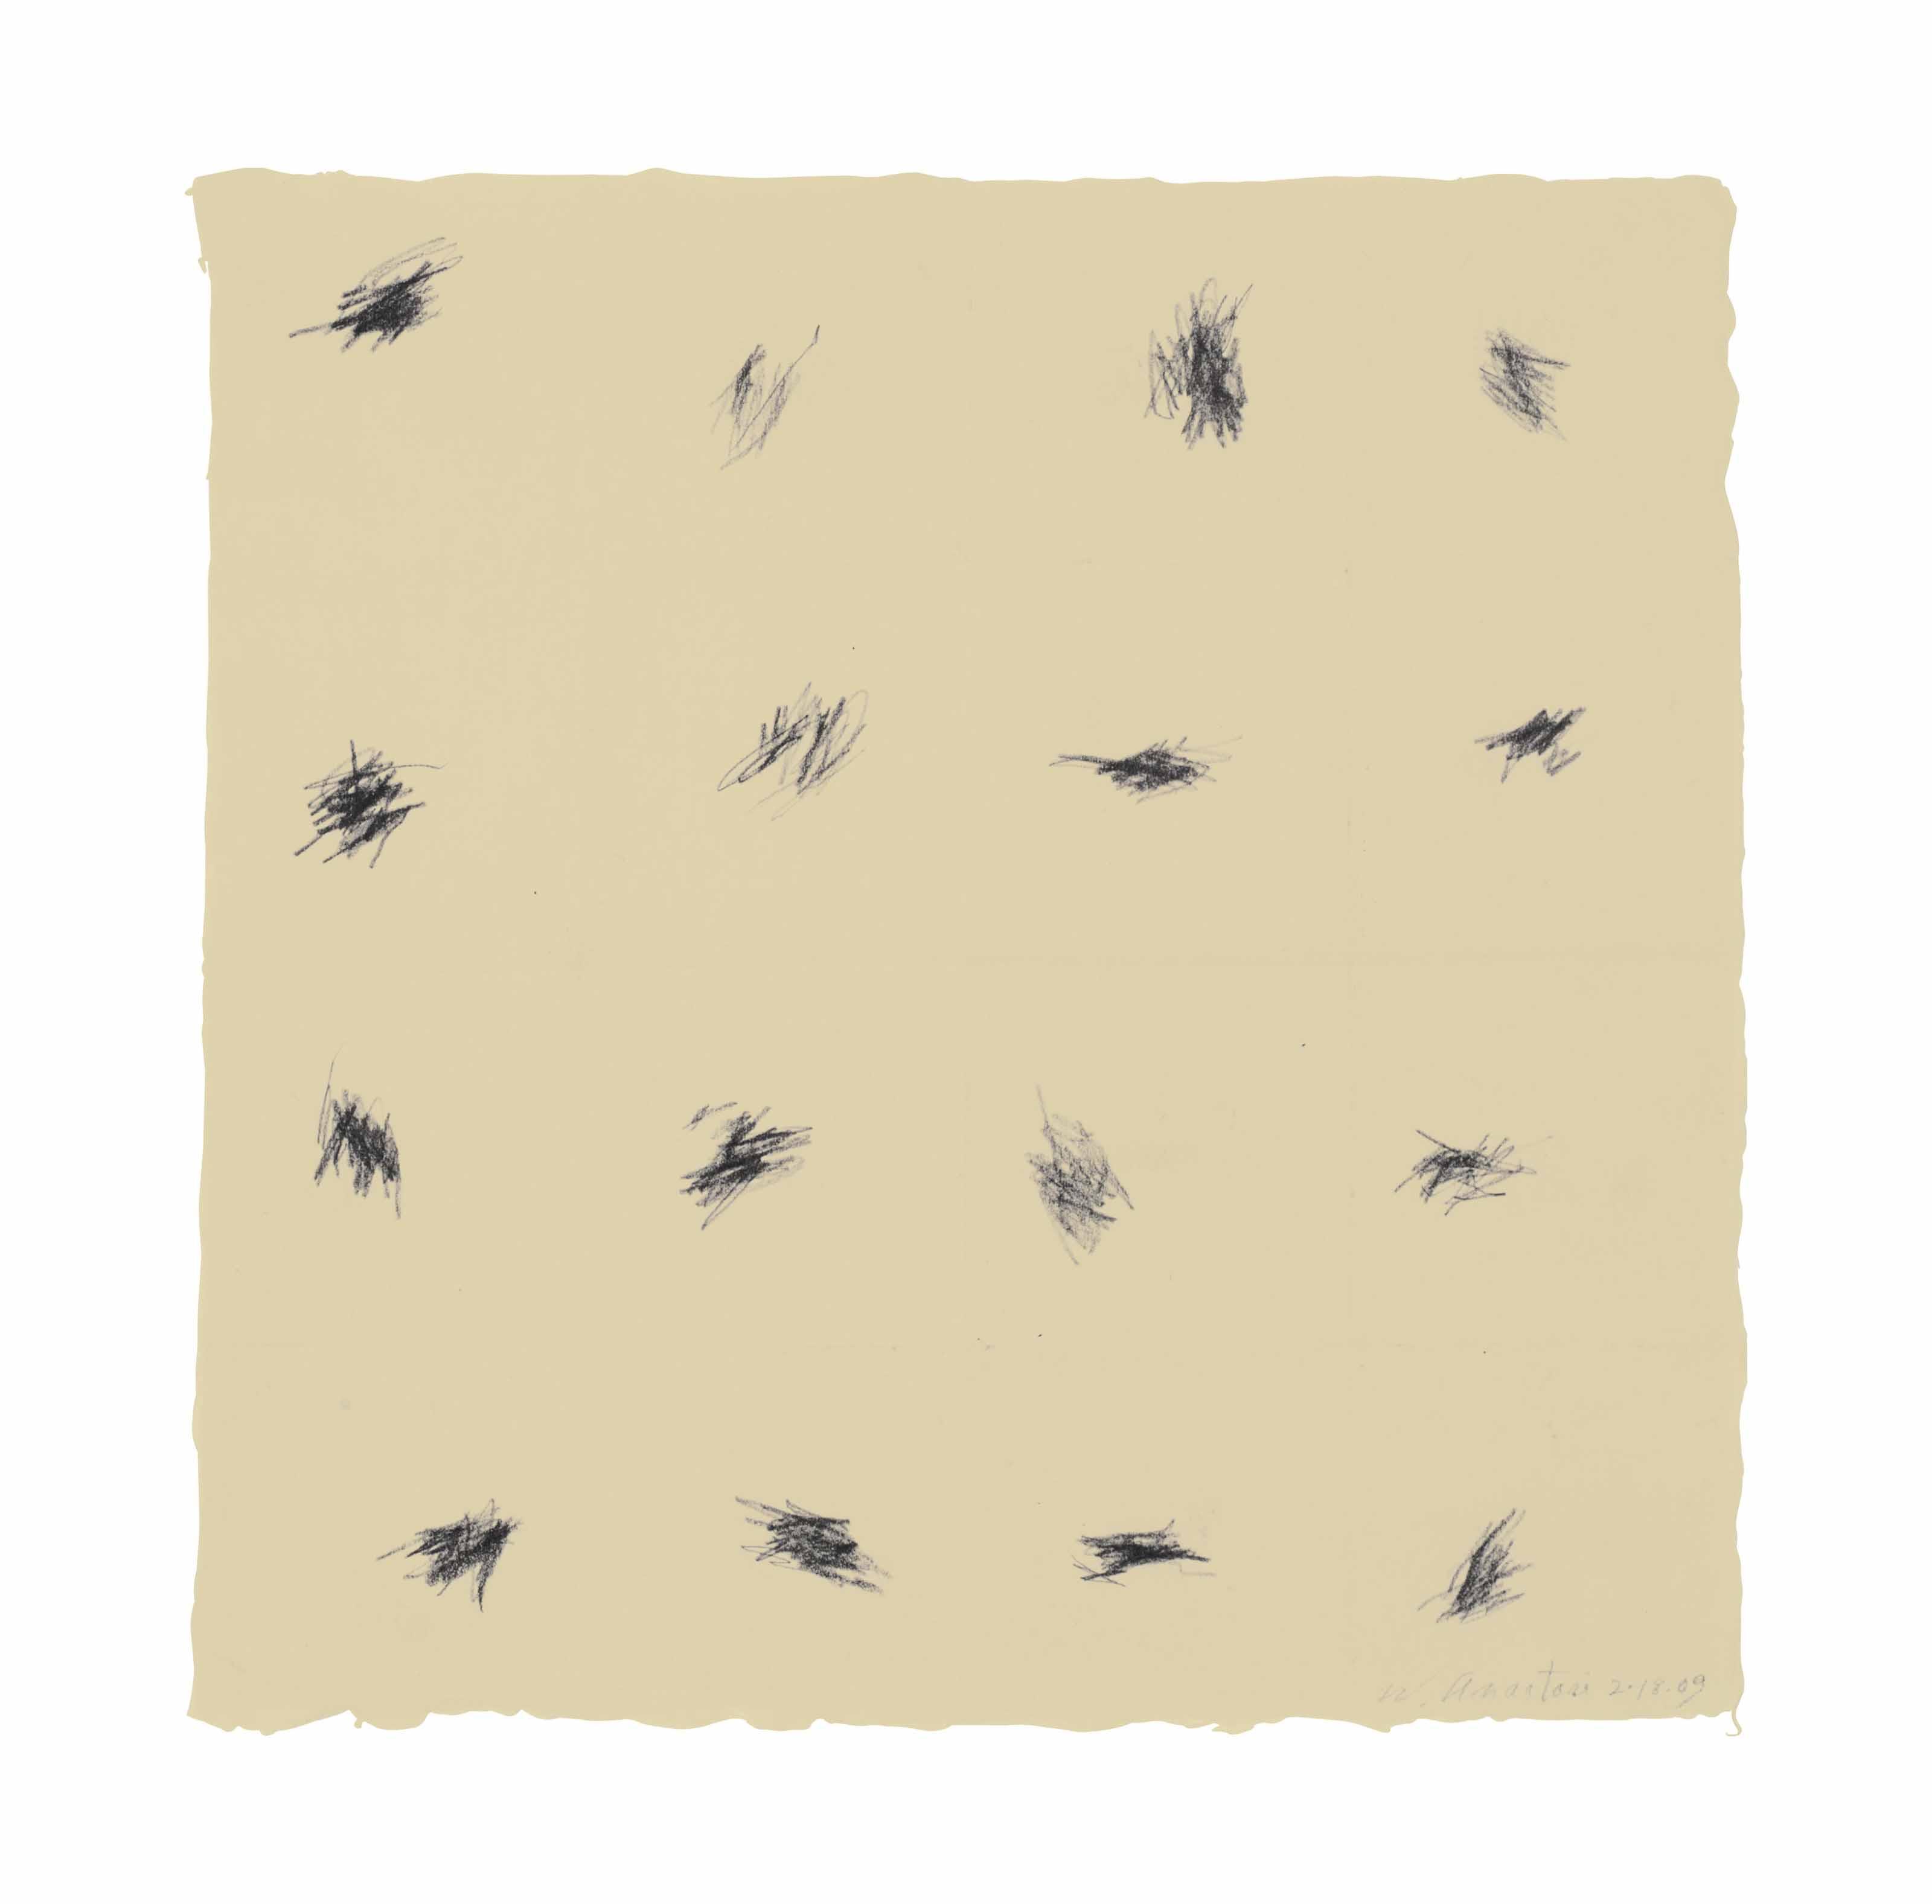 Untitled (Pocket Drawing)